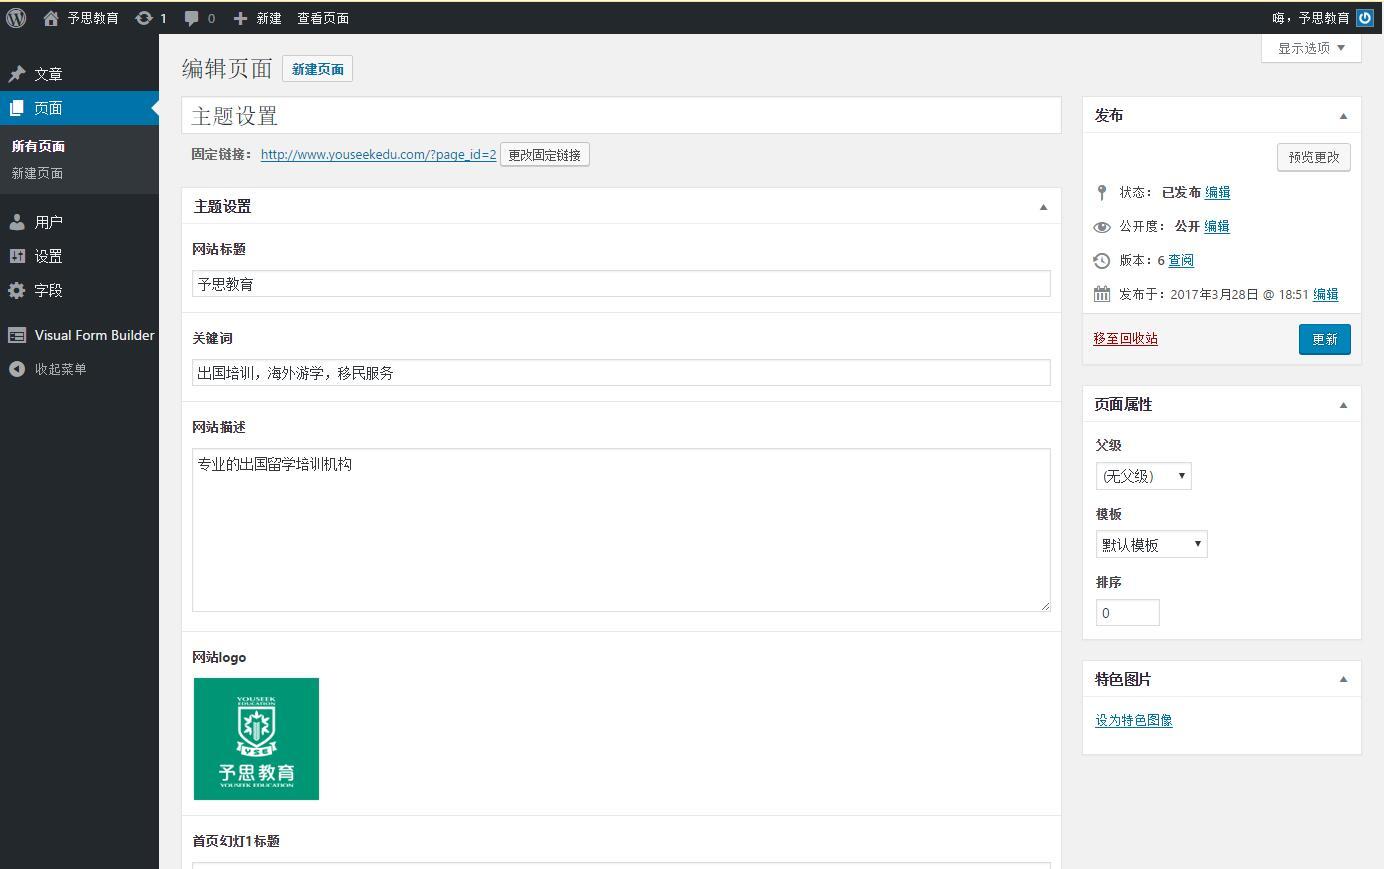 WordPress插件advanced custom fields自定义字段使用教程